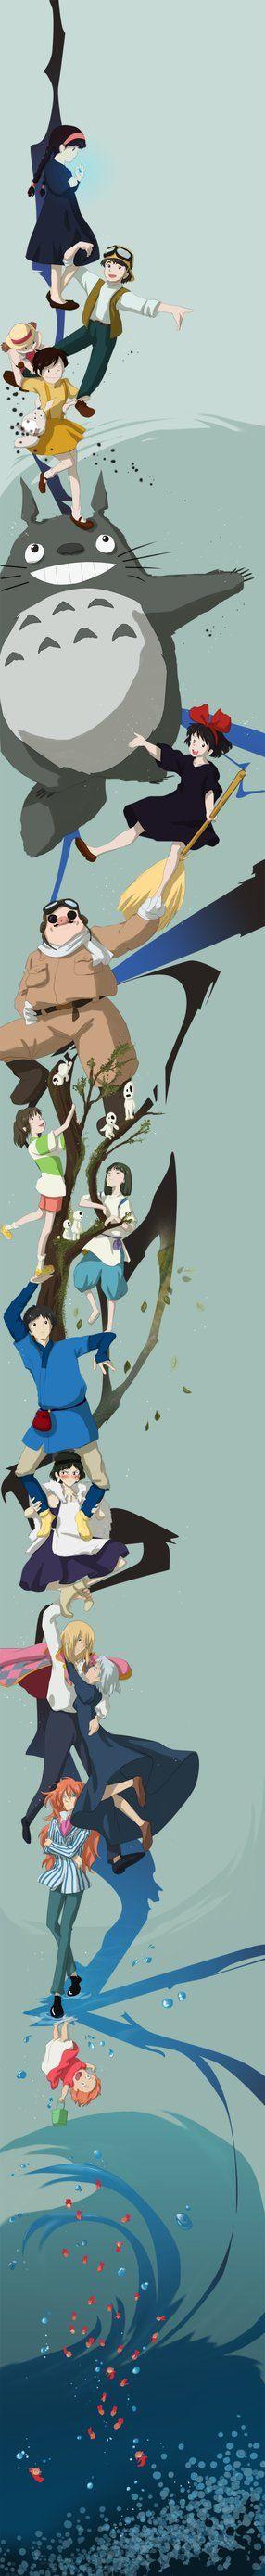 Hayao Miyazaki (Japanese)